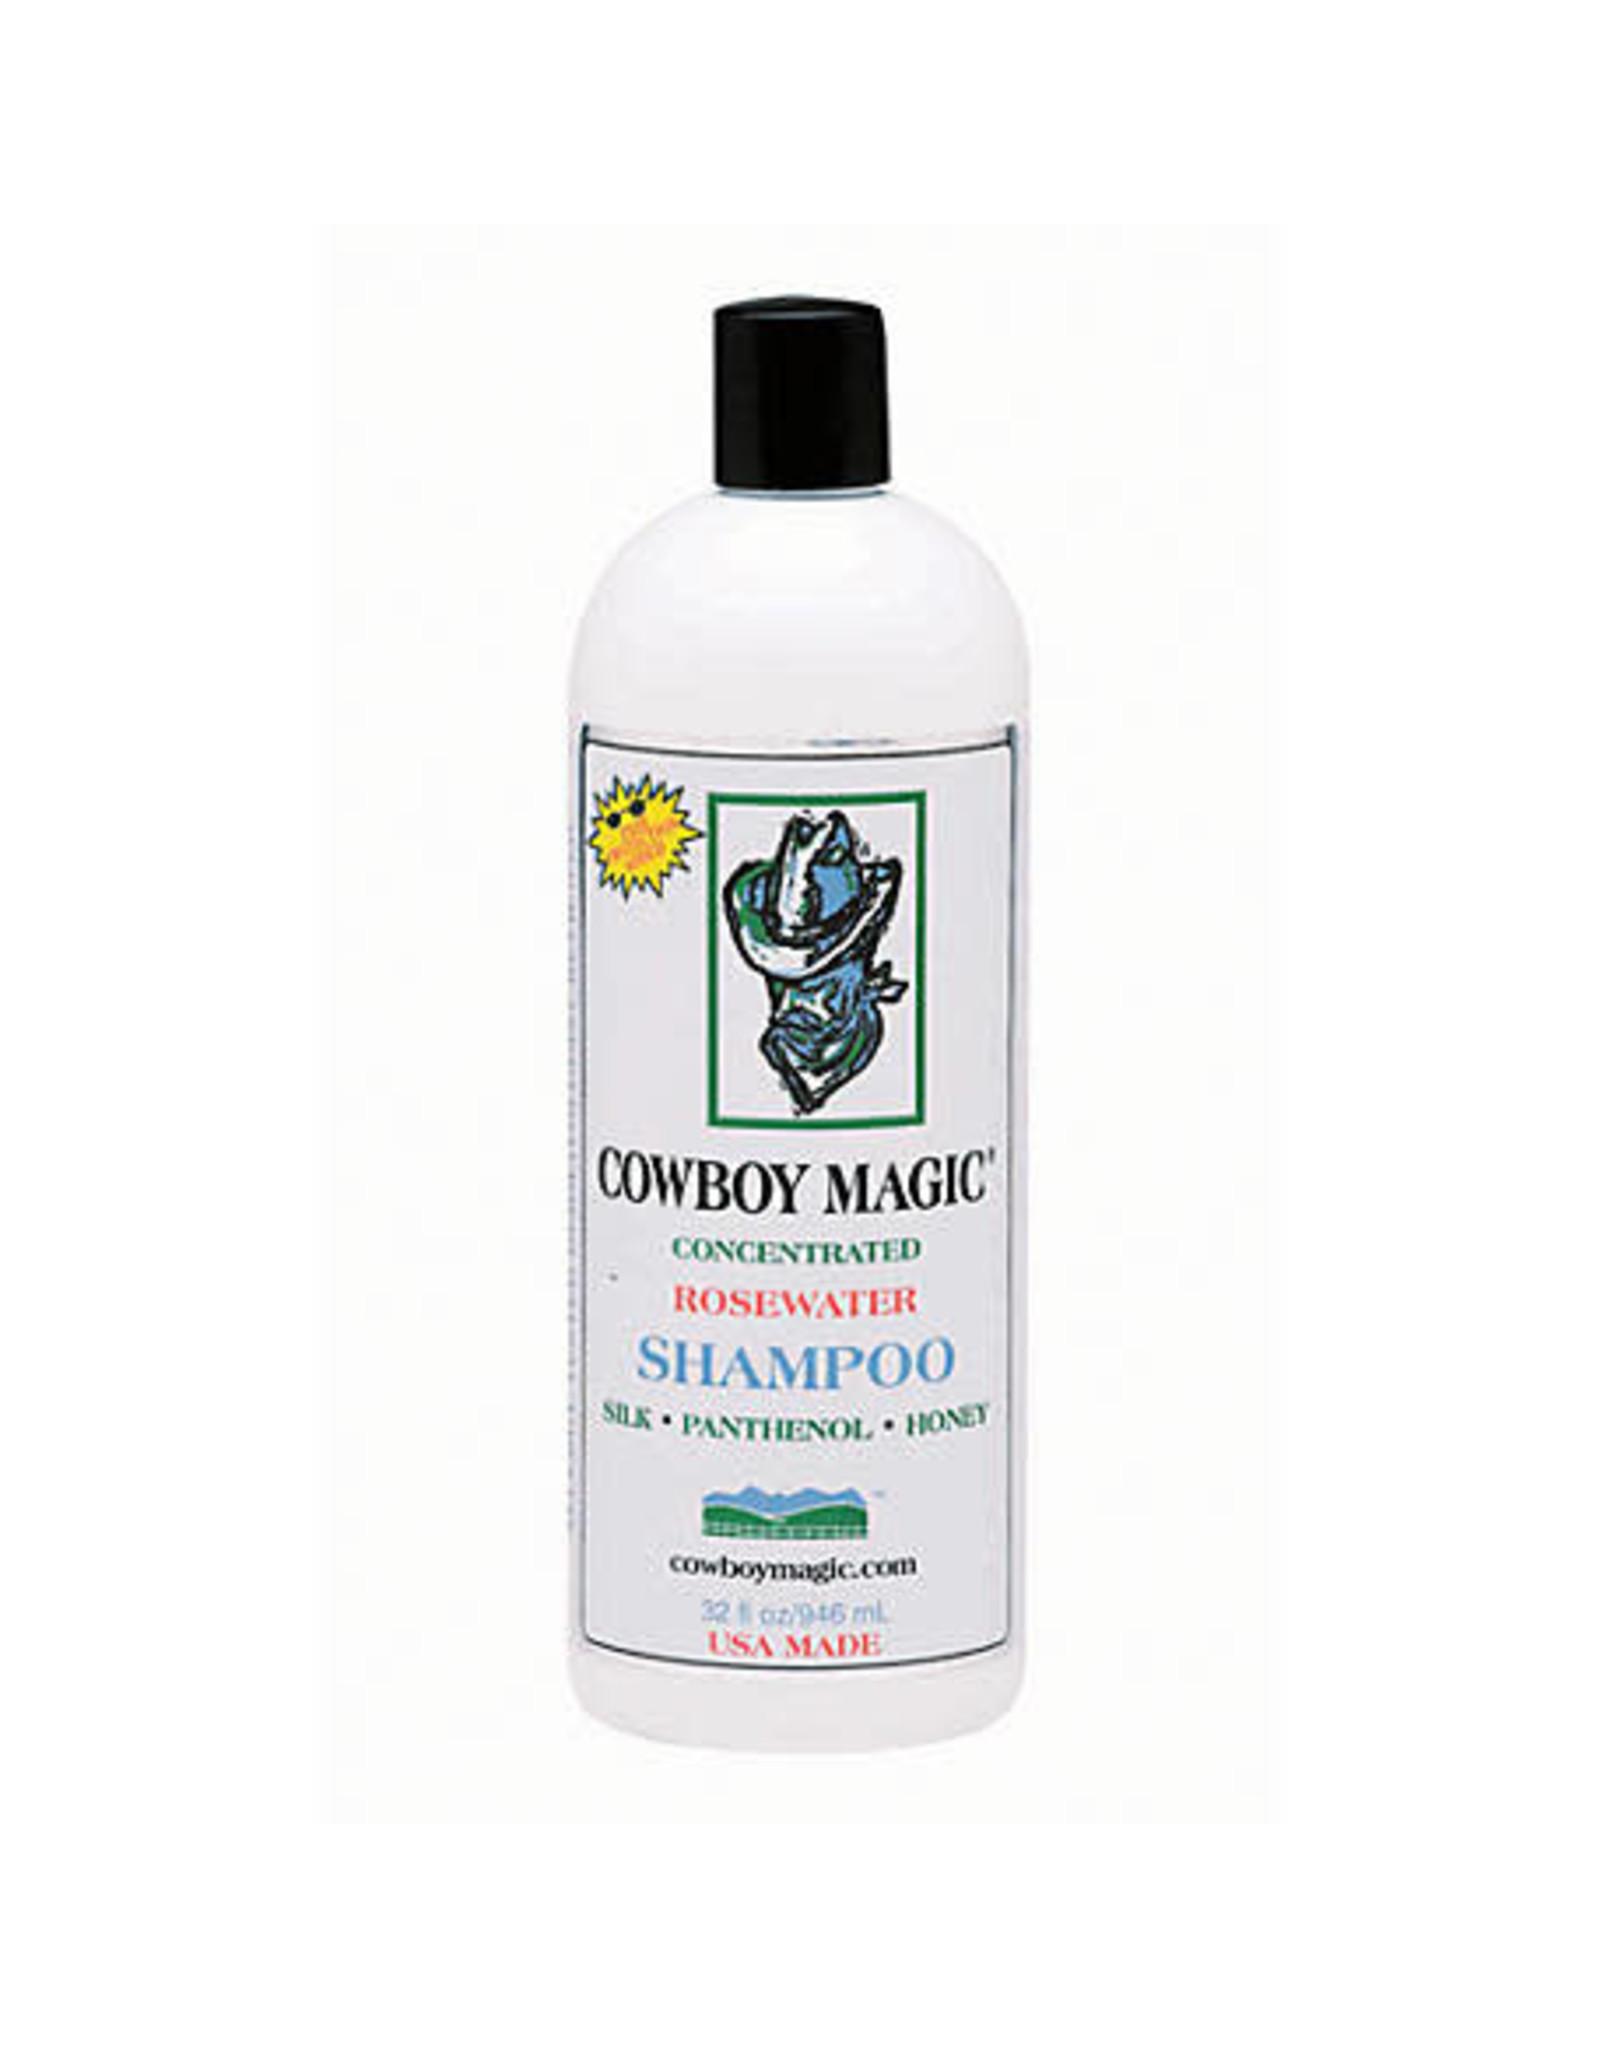 Cowboy Magic Cowboy Magic Rosewater Shampoo 32oz